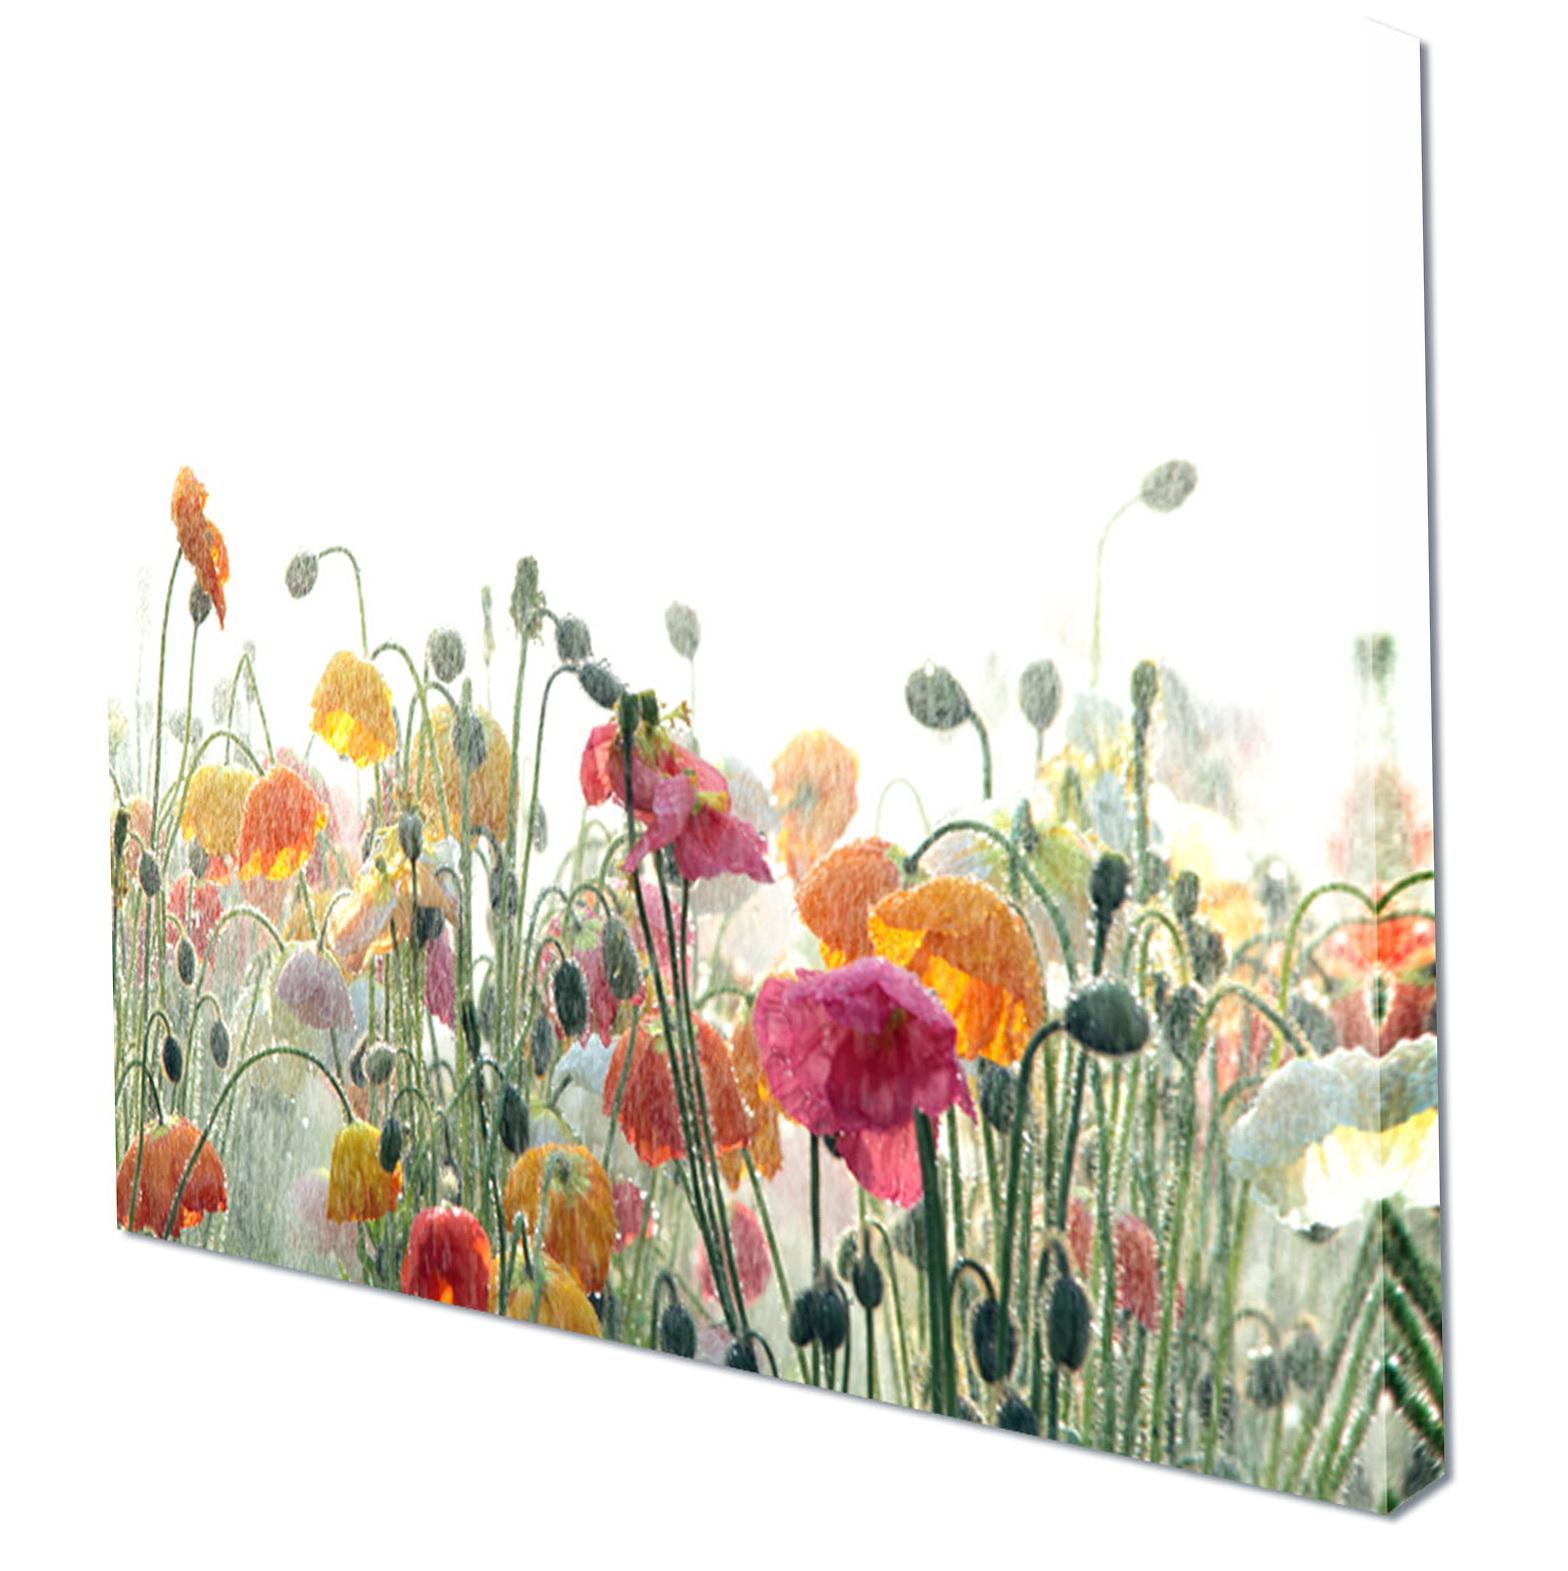 Cheap Canvas Wall Art Prints